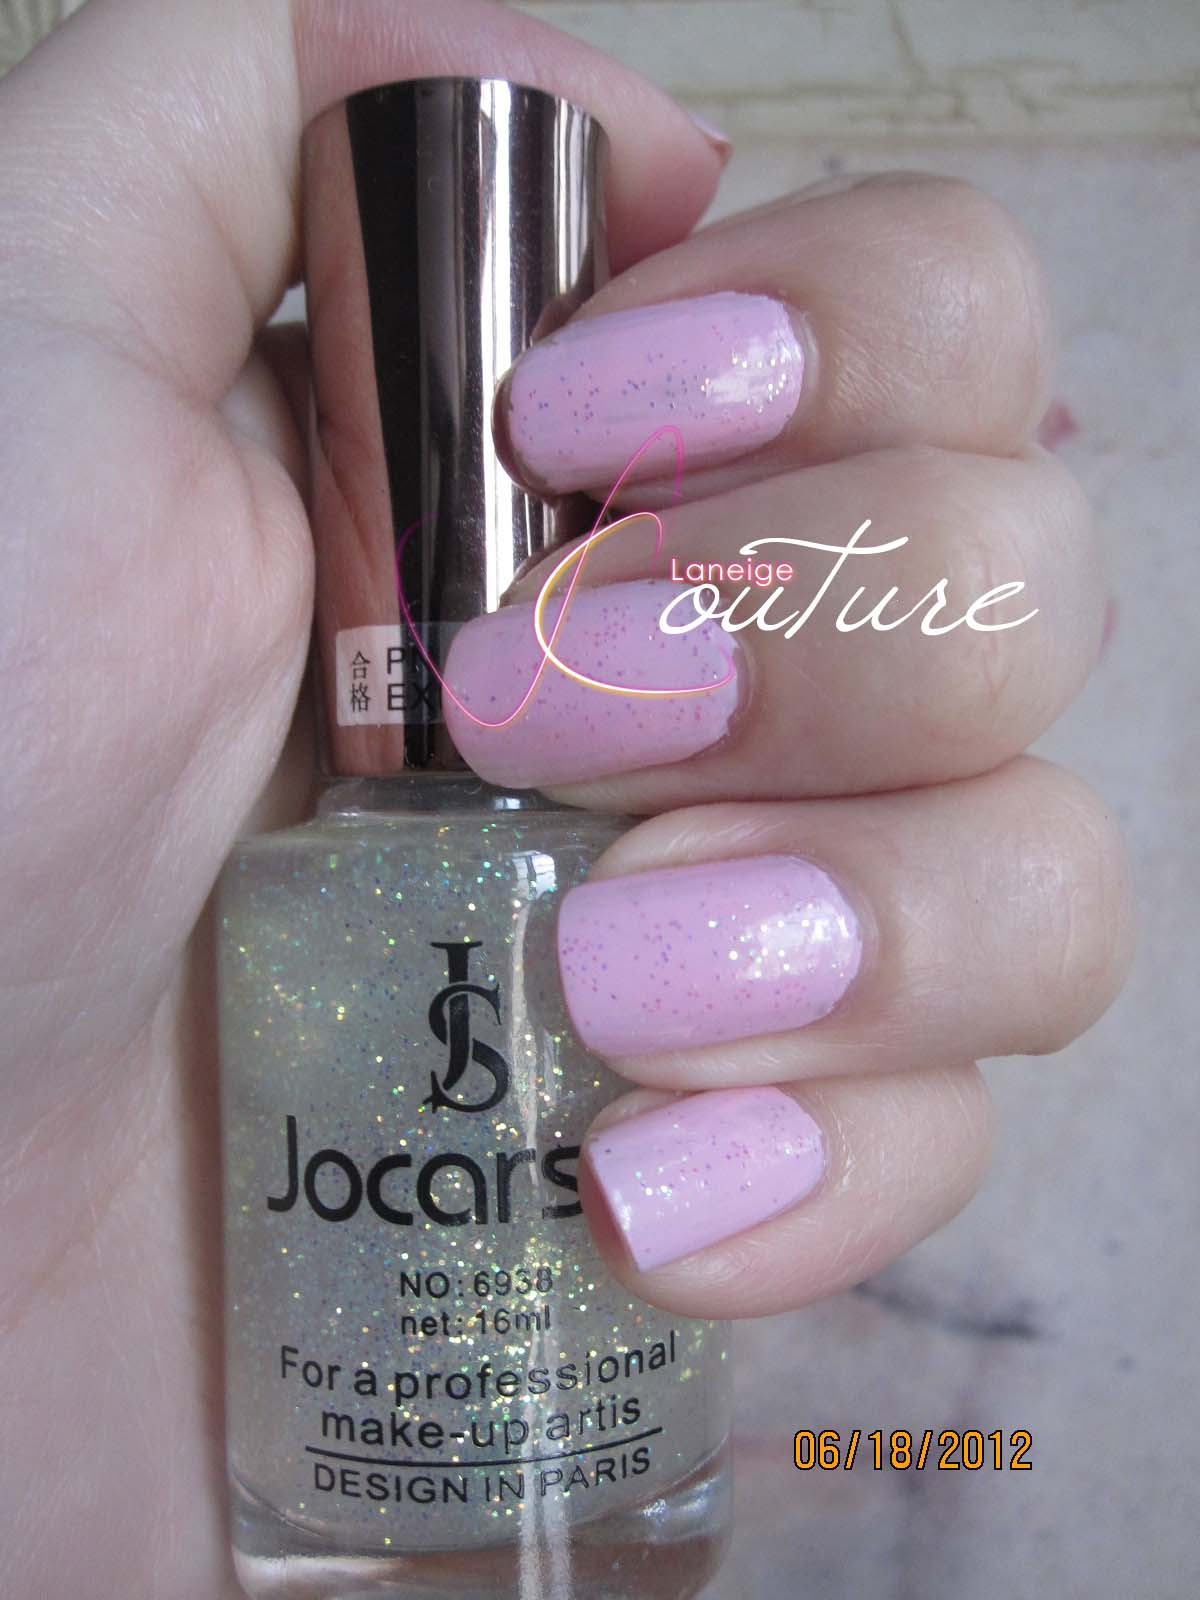 laneigecouture: jocarste nail polish review